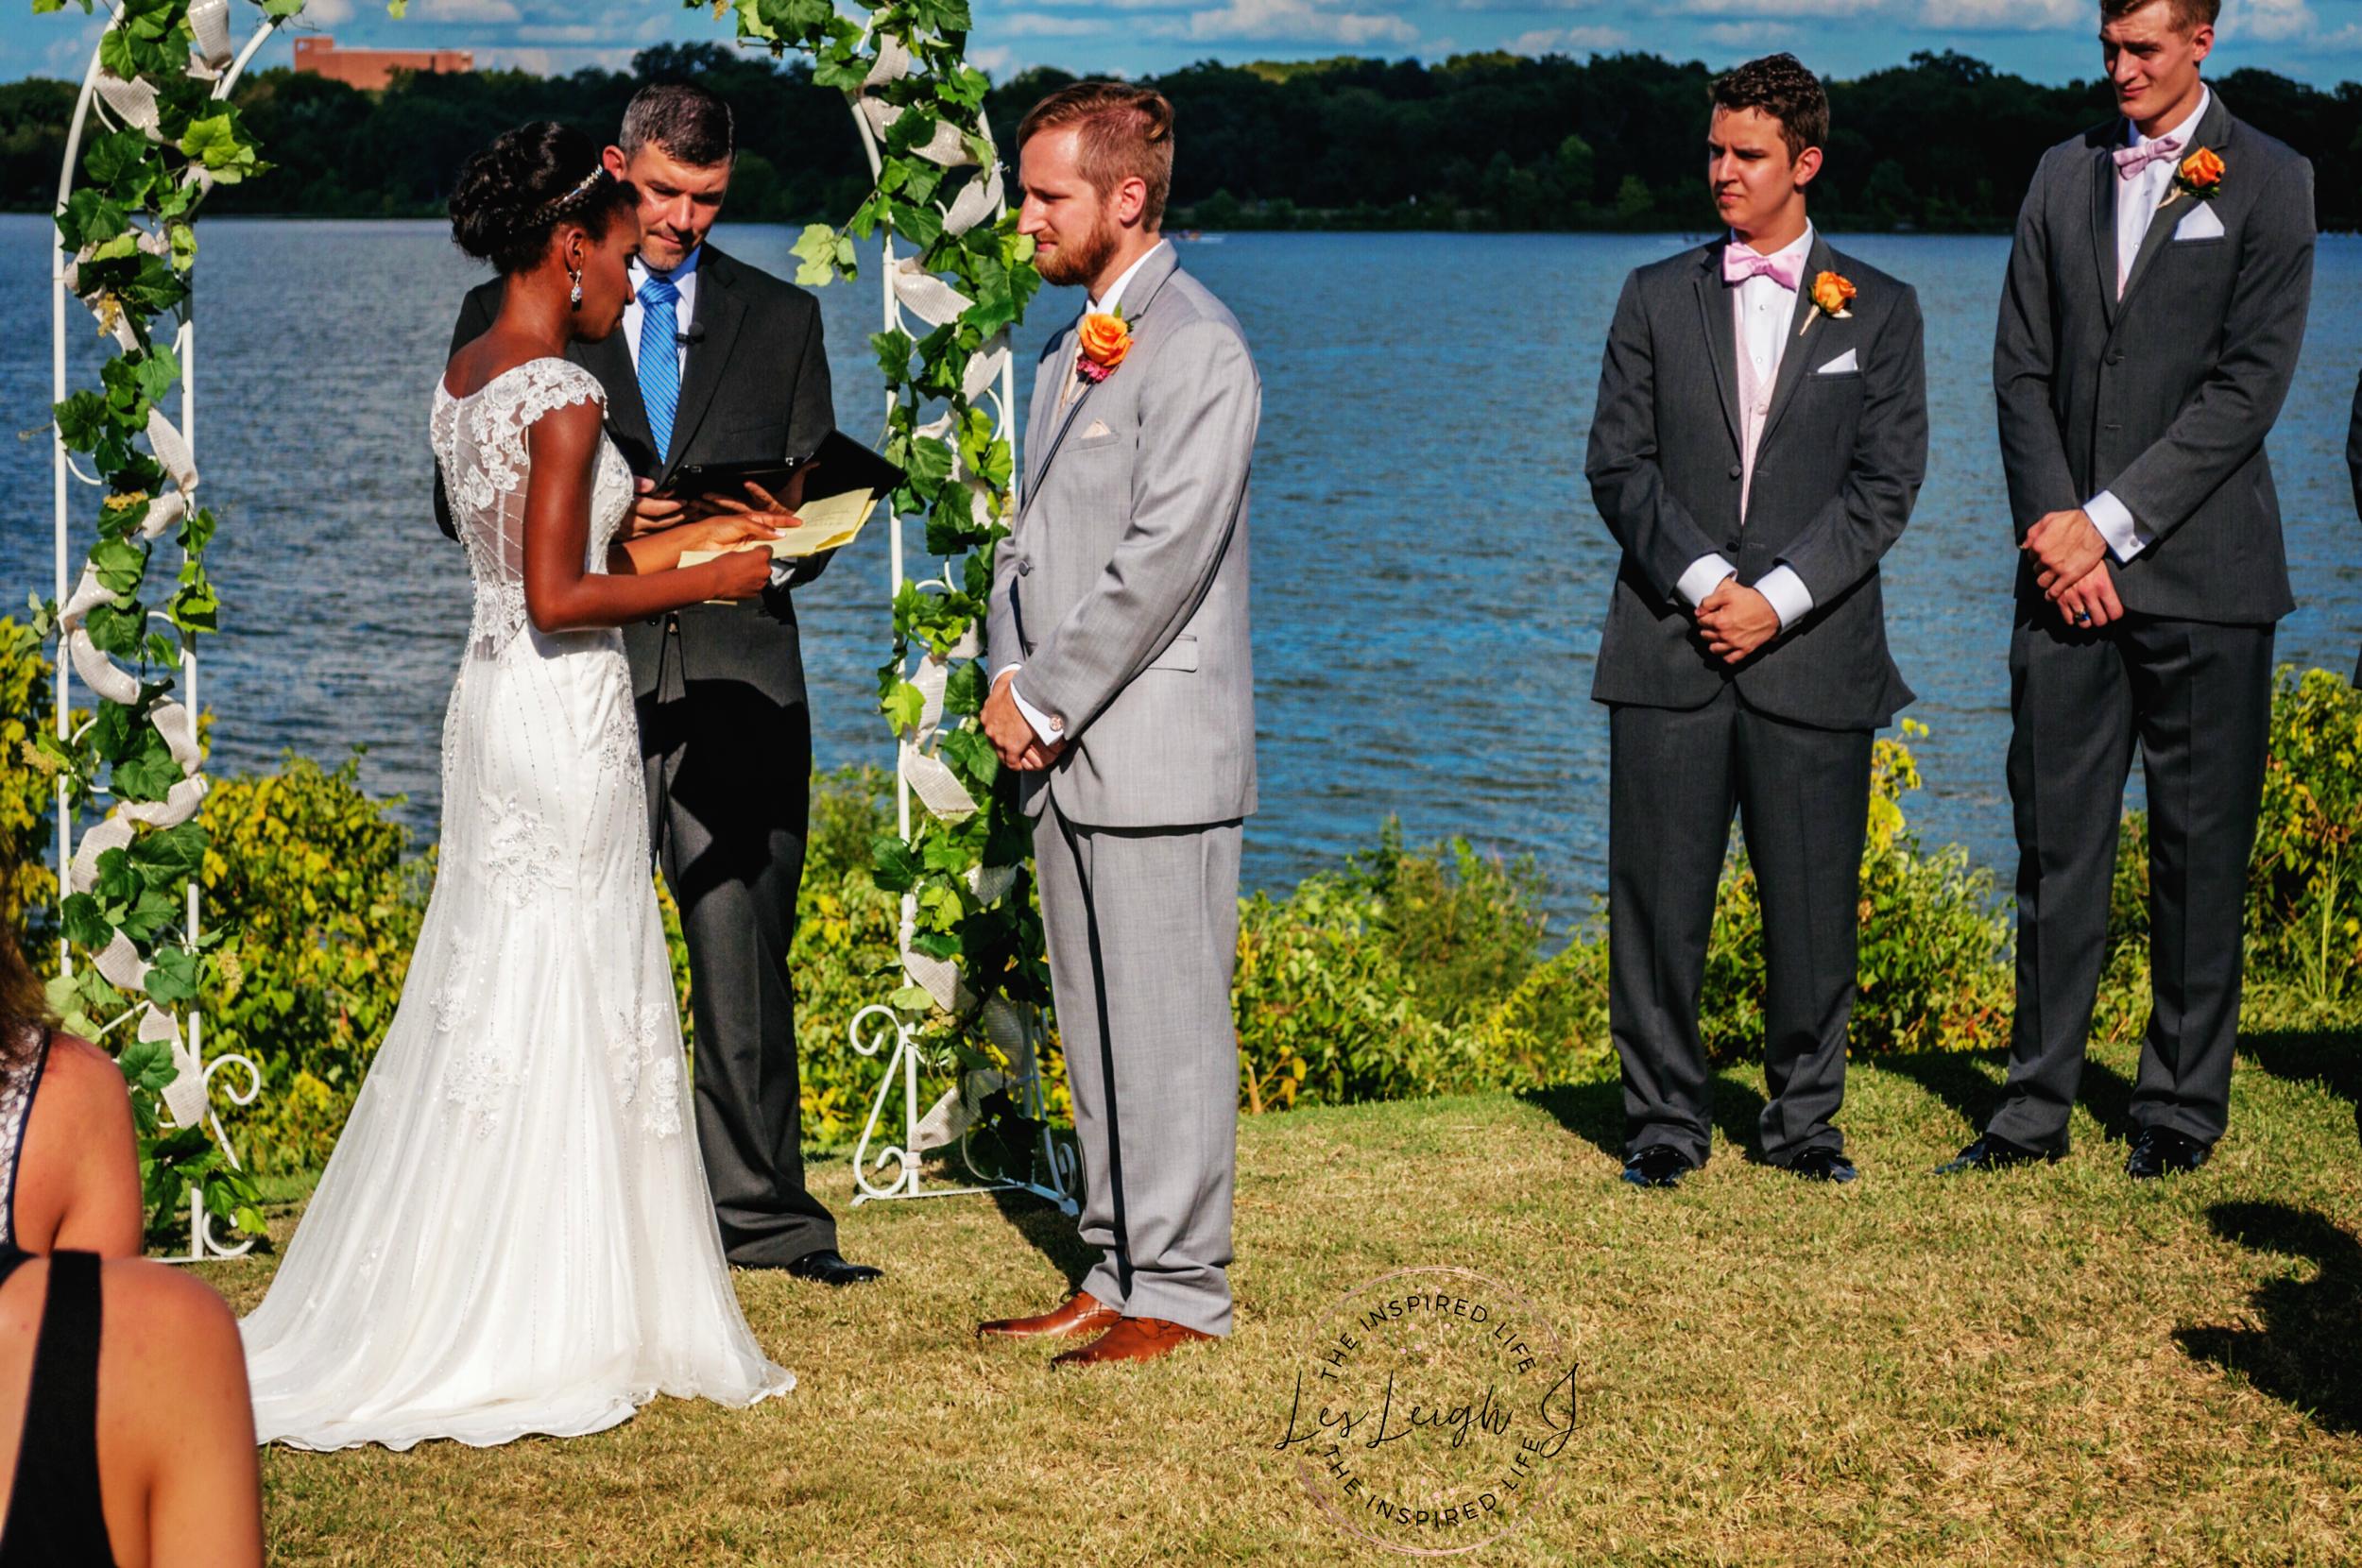 Wedding on the Lake 2